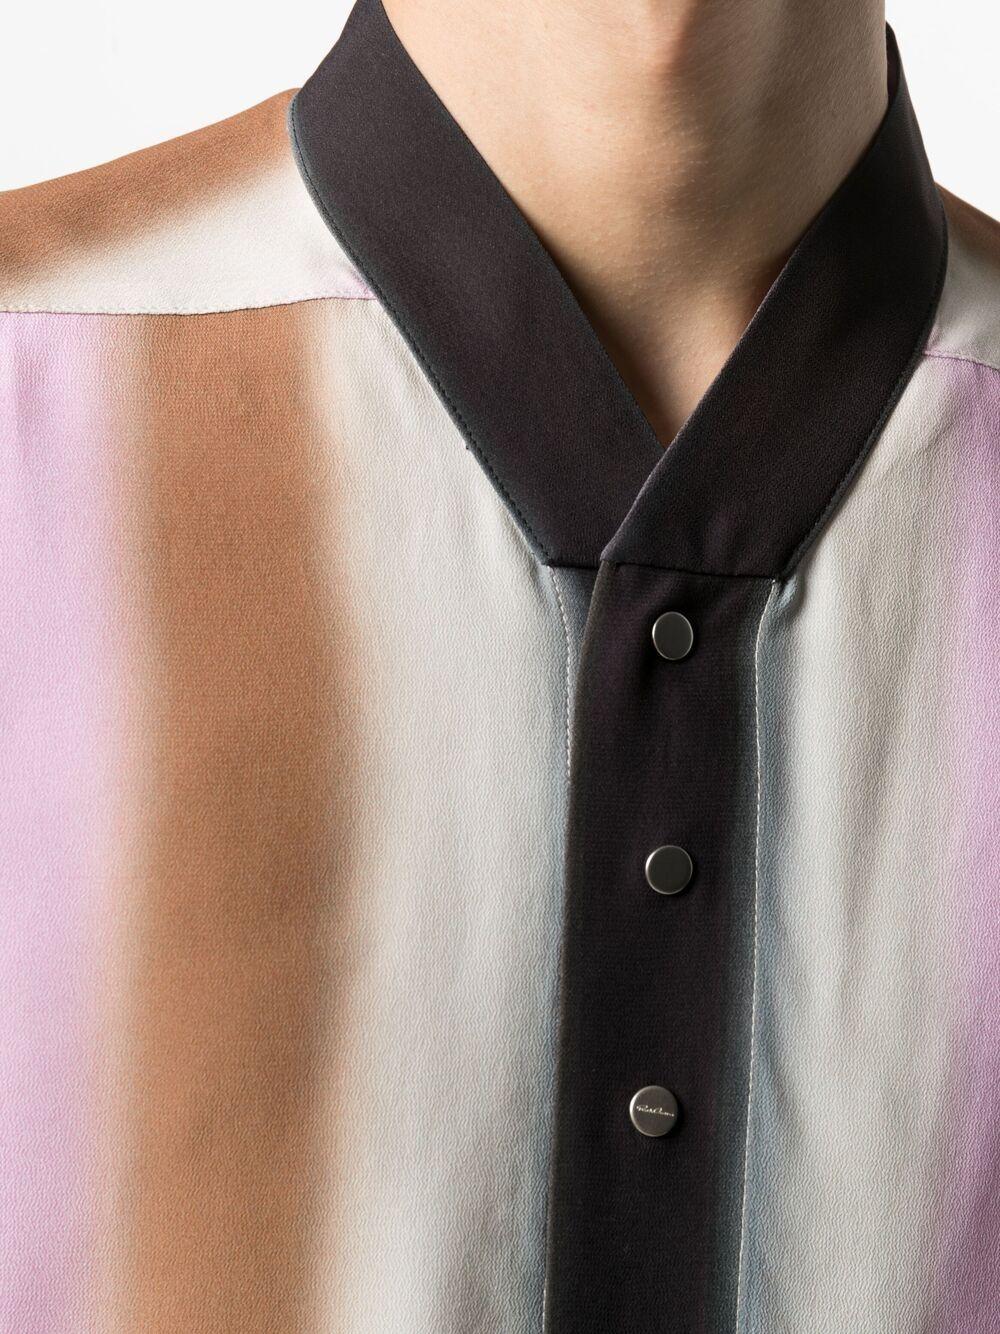 STRIPE SHIRT RICK OWENS | Shirts | RU21S6290 CCP10A